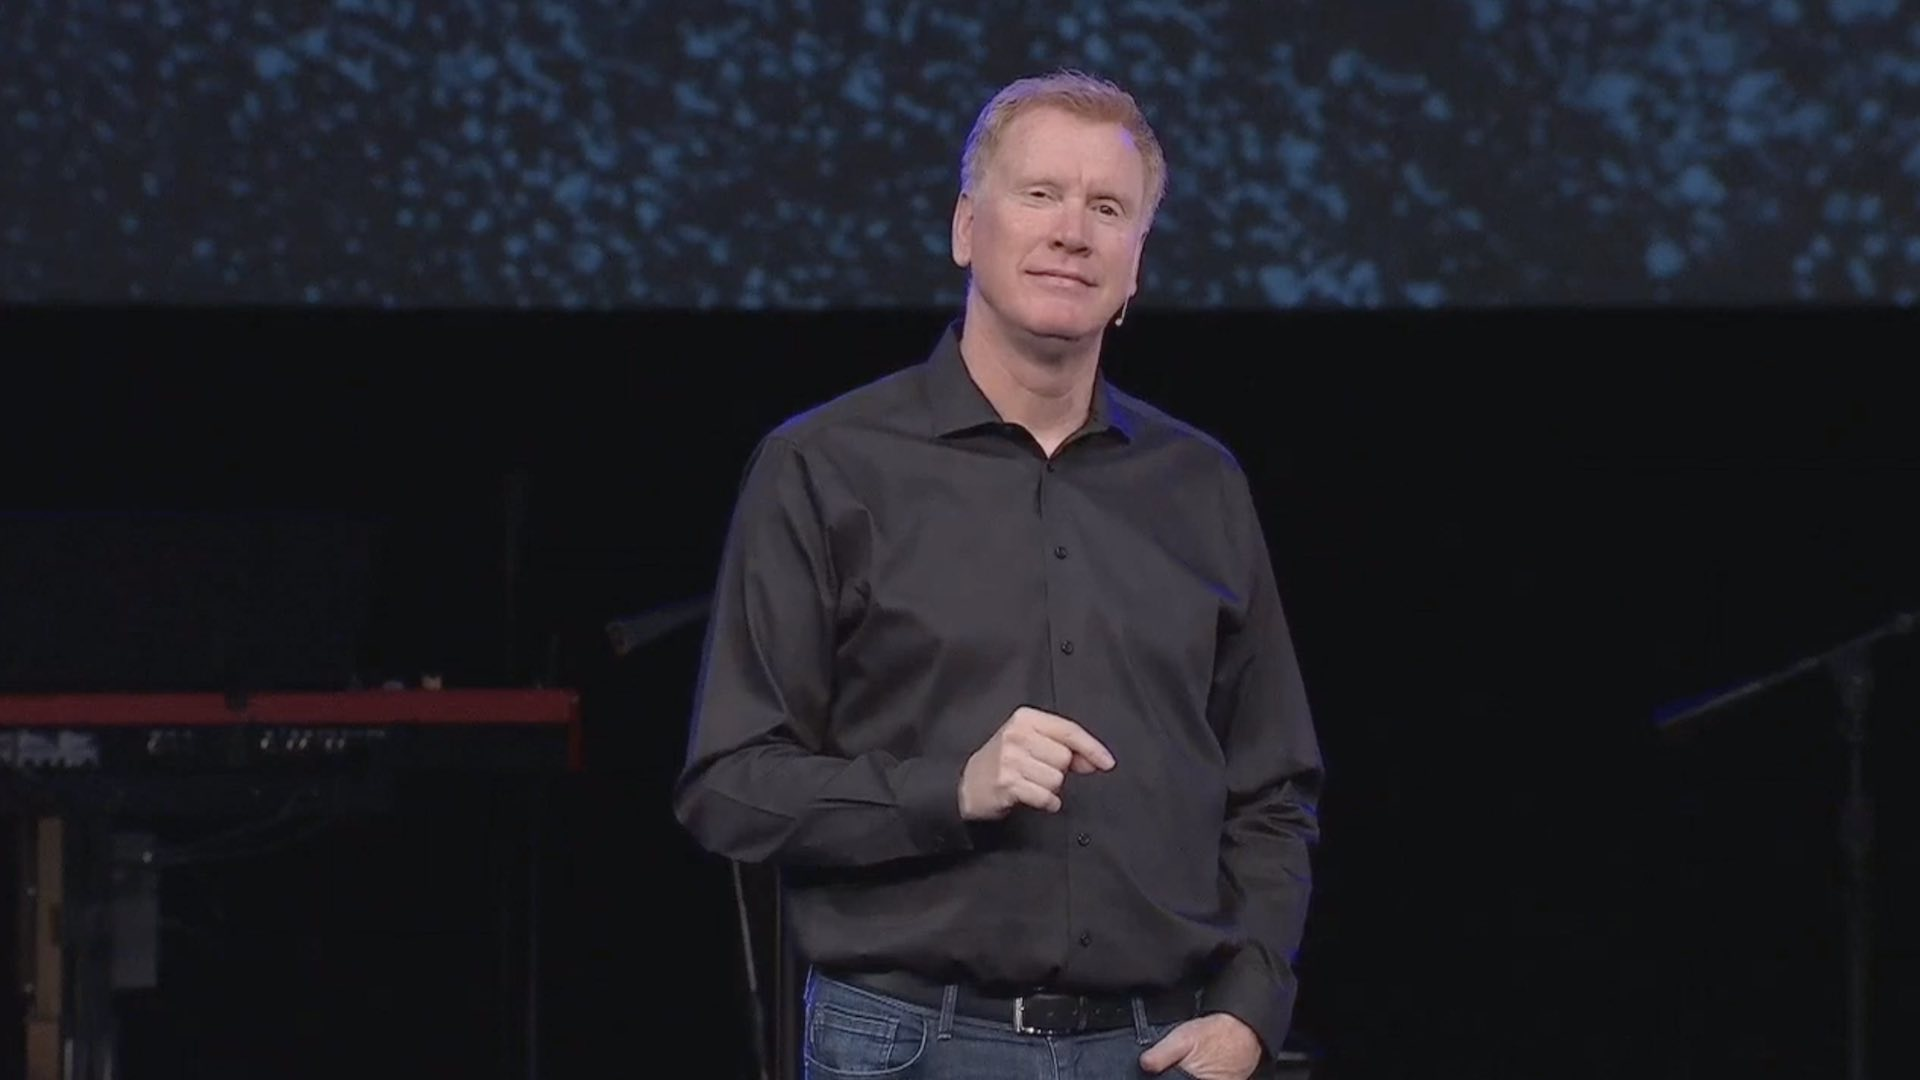 Facing Our Fears (Sermon)